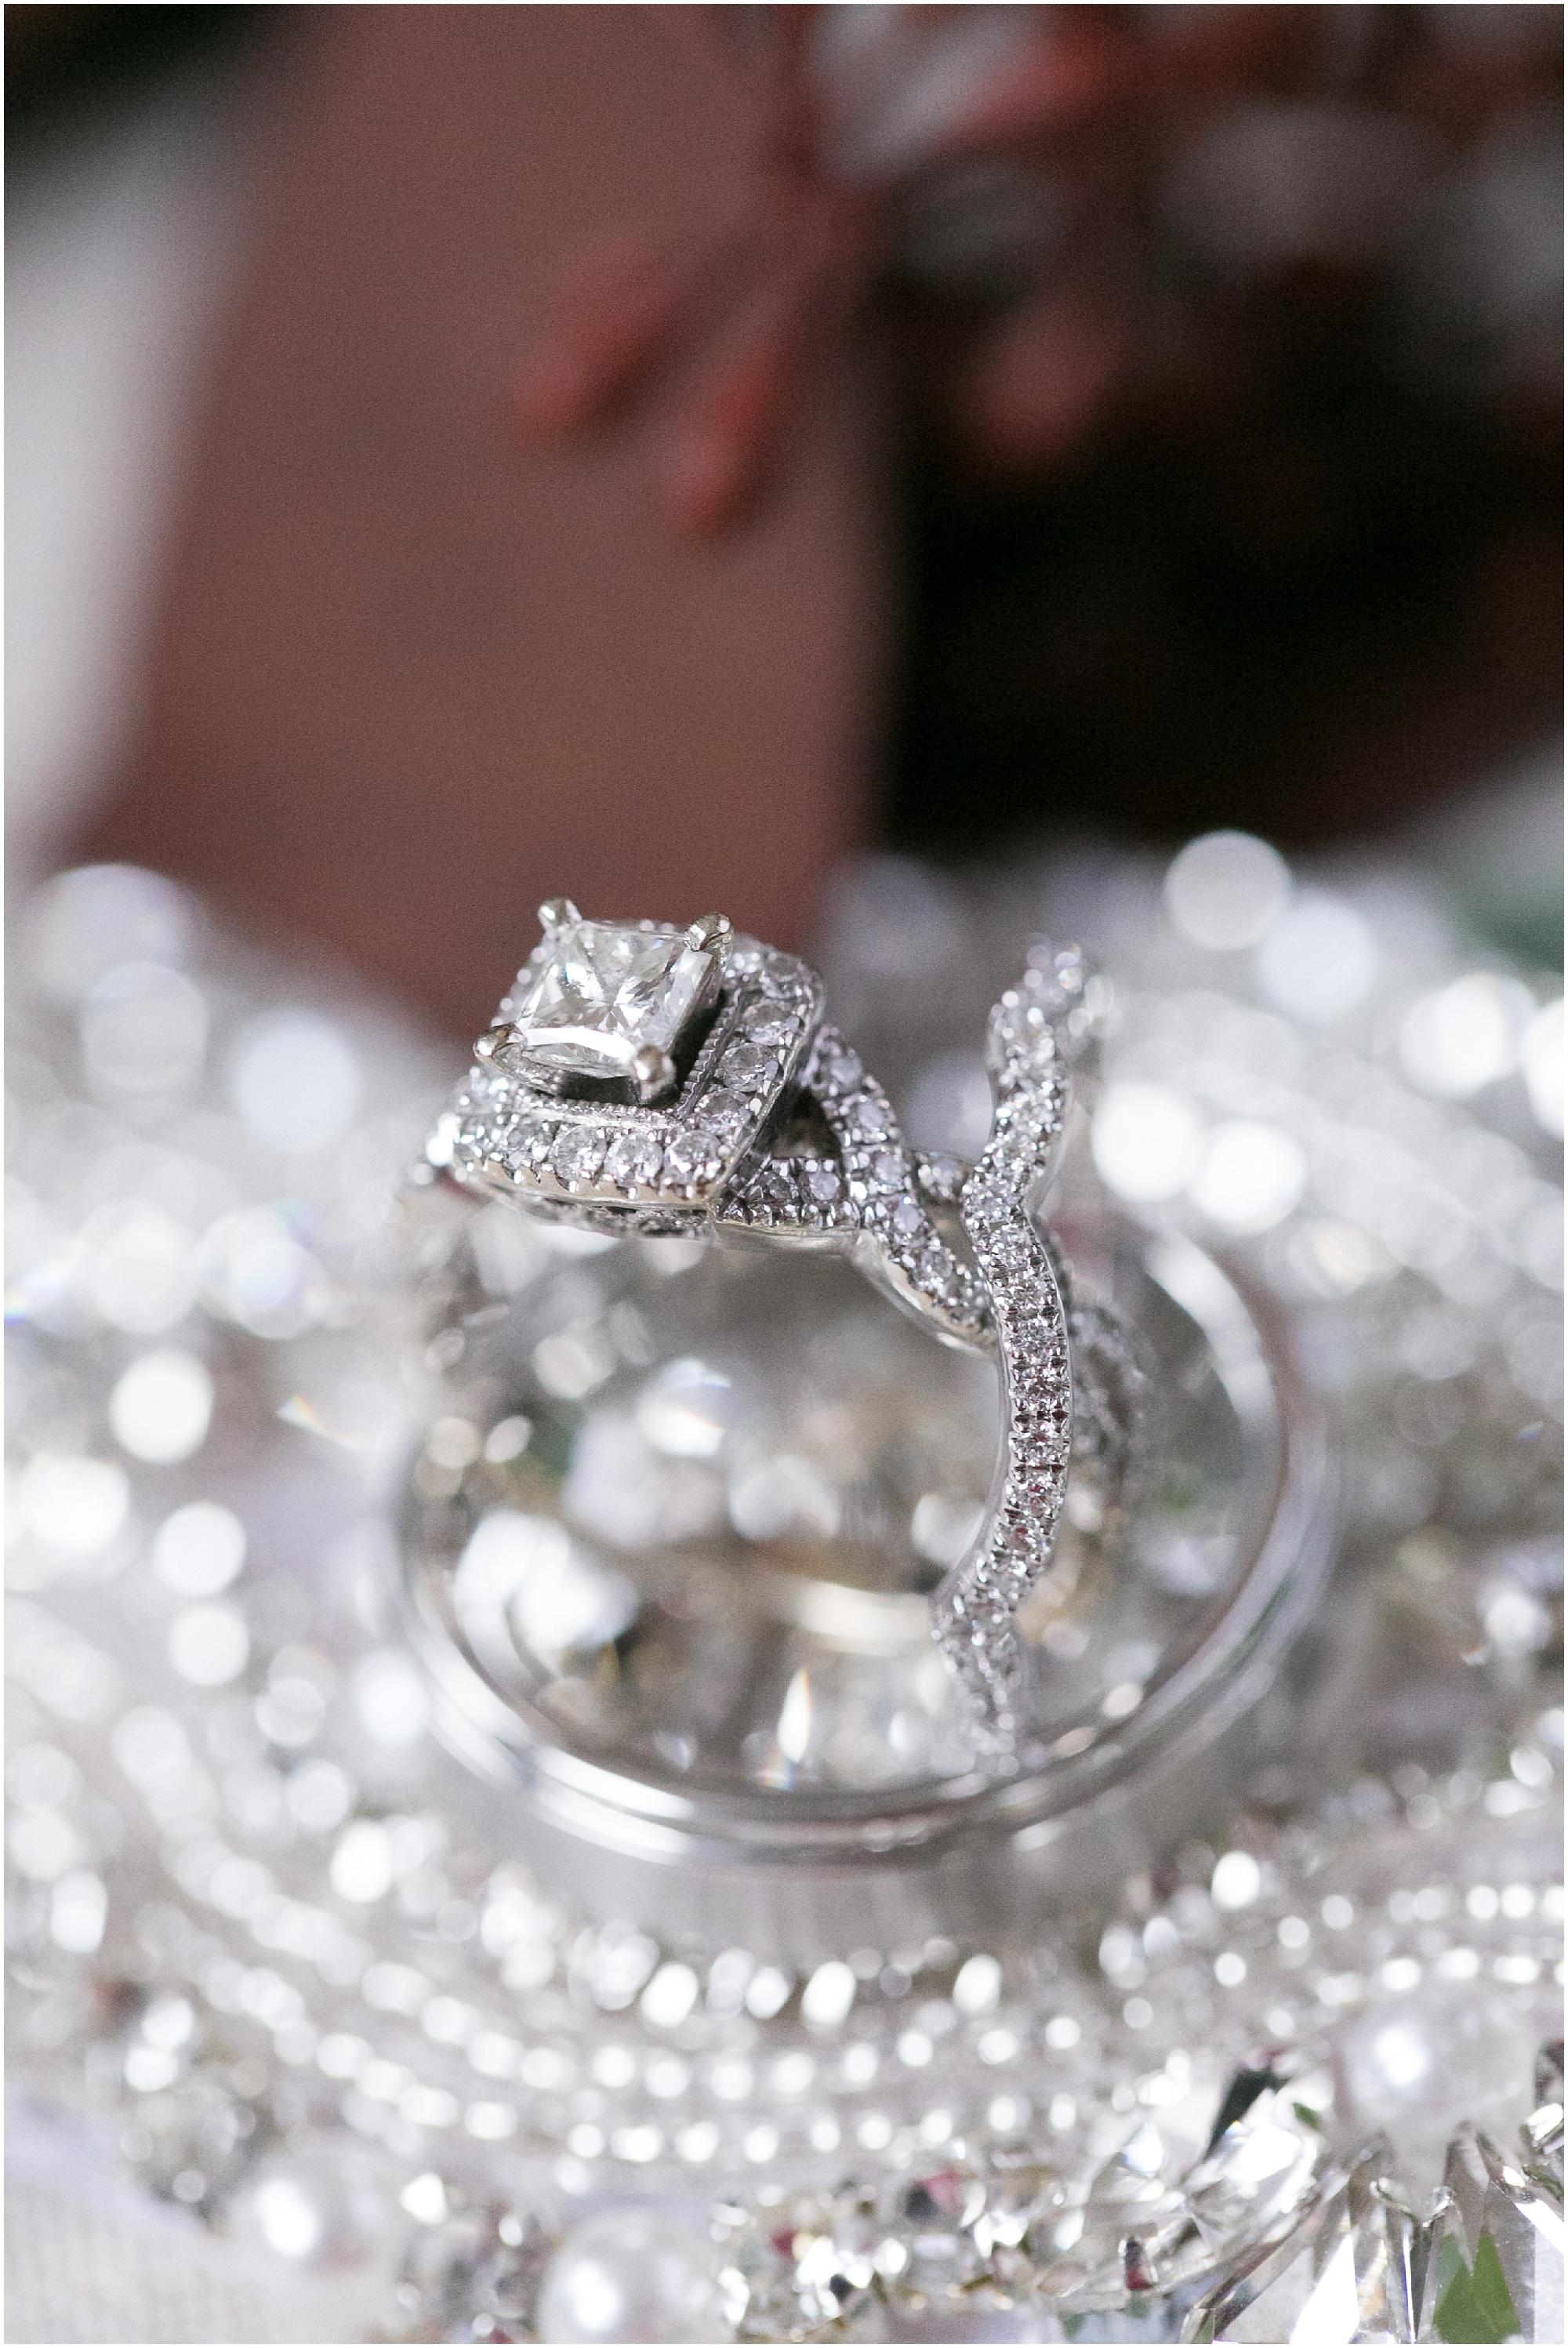 wedding rings obici house wedding in suffolk virginia, virginia wedding photographer